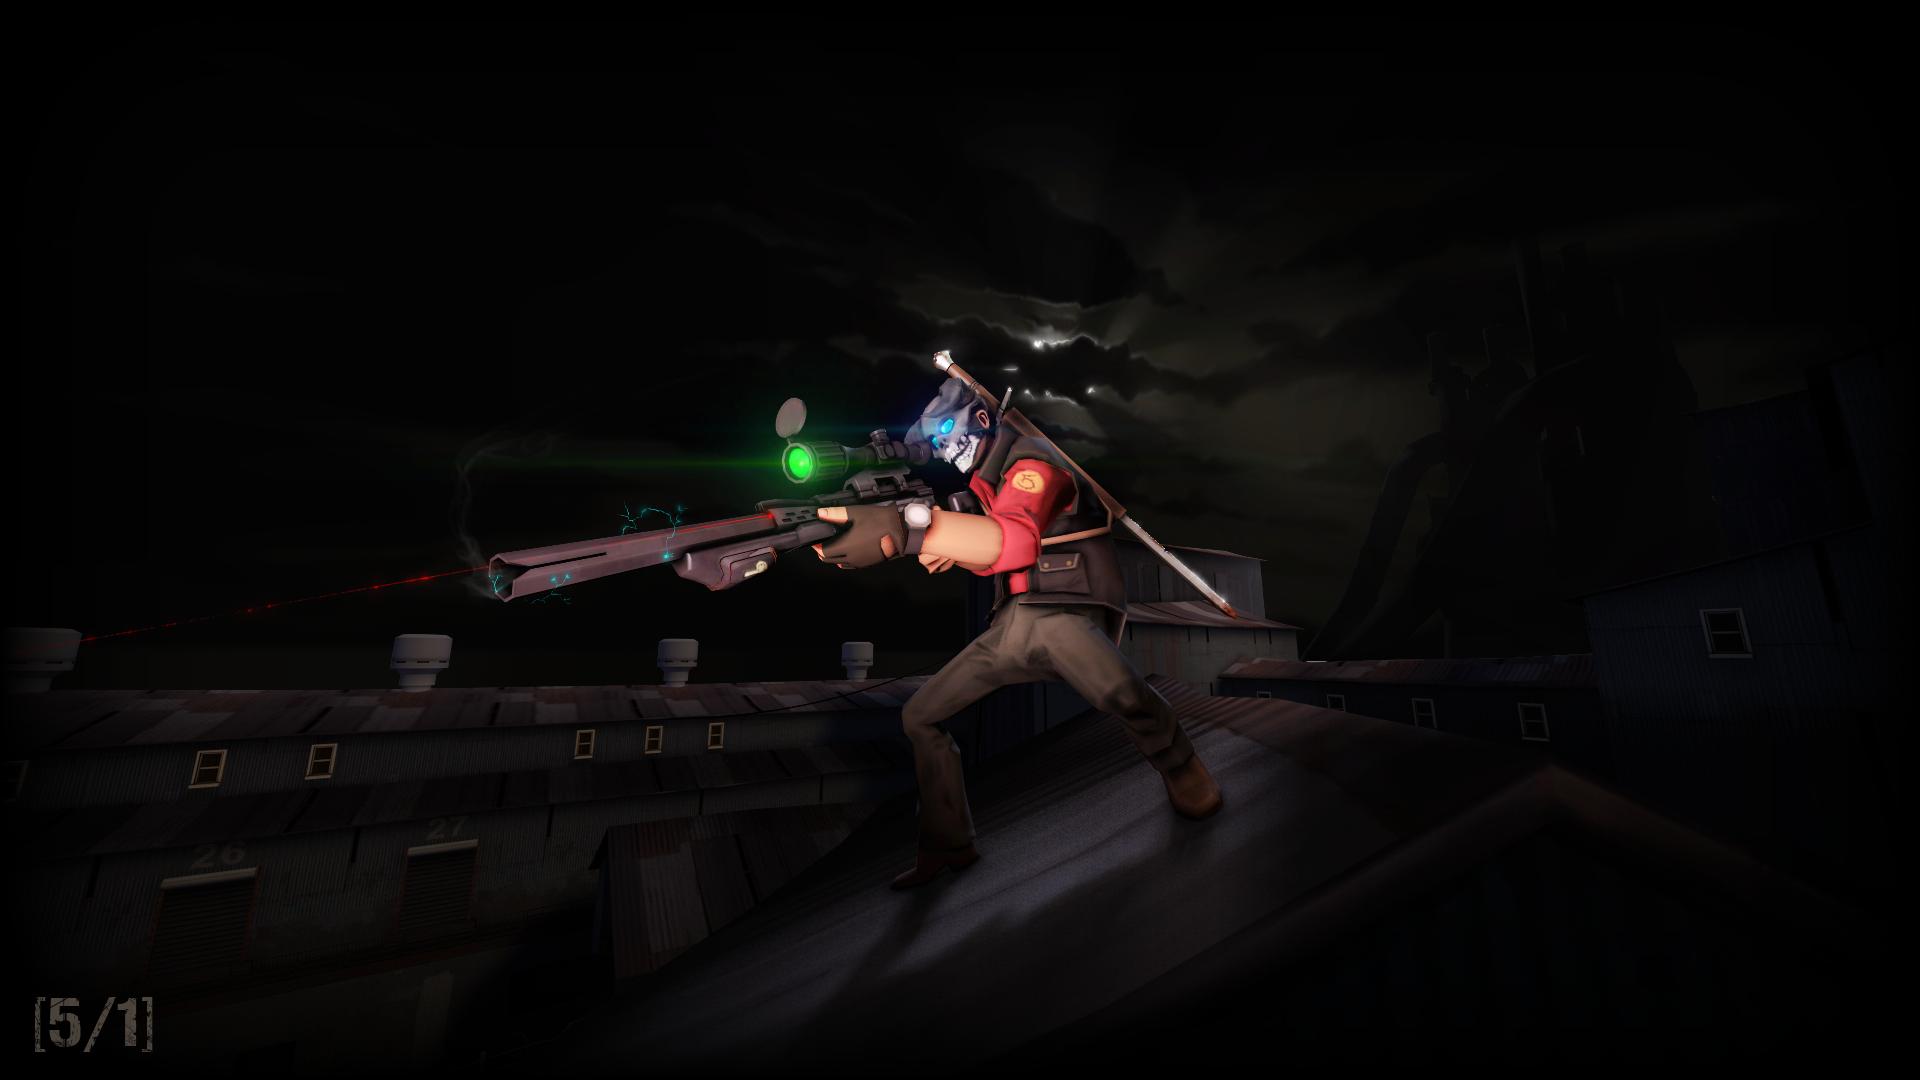 TF2 Sniper Wallpaper HD - WallpaperSafari